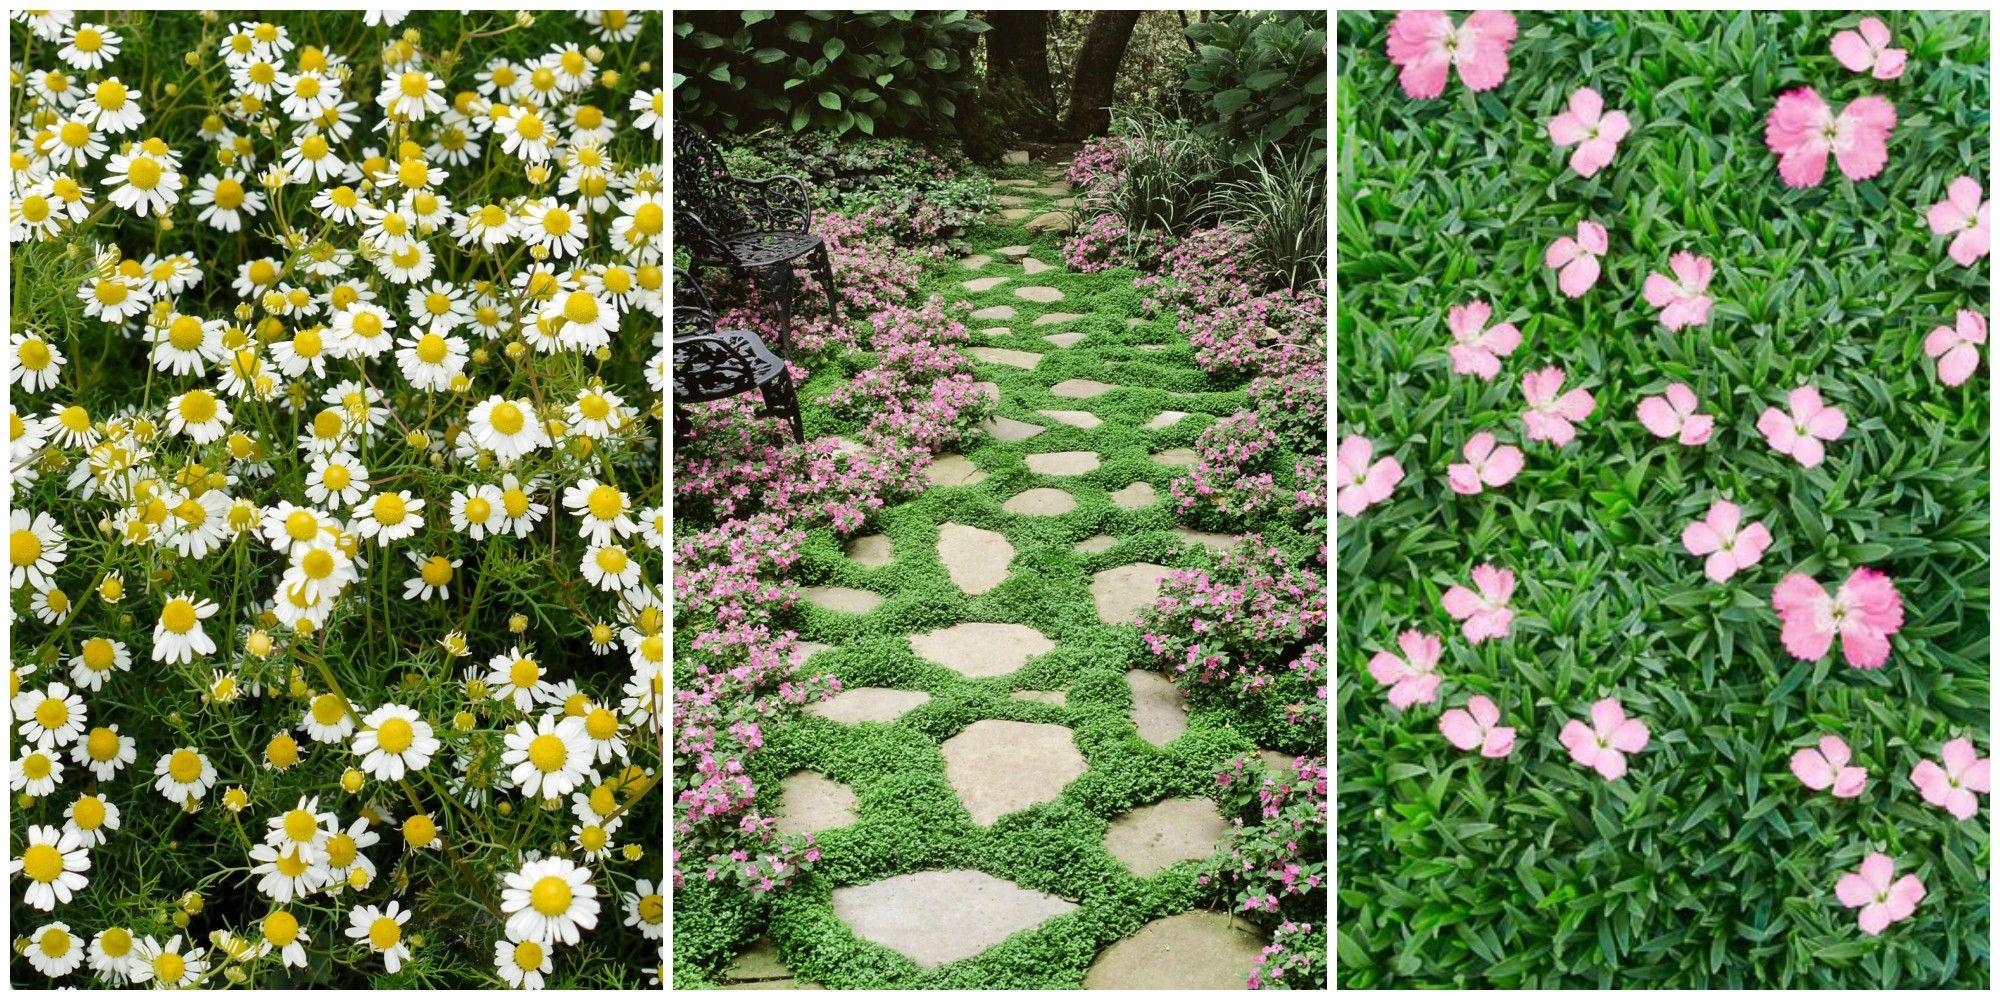 Shade Loving Perennial Flowers Zone 6 Perennials For The Edge